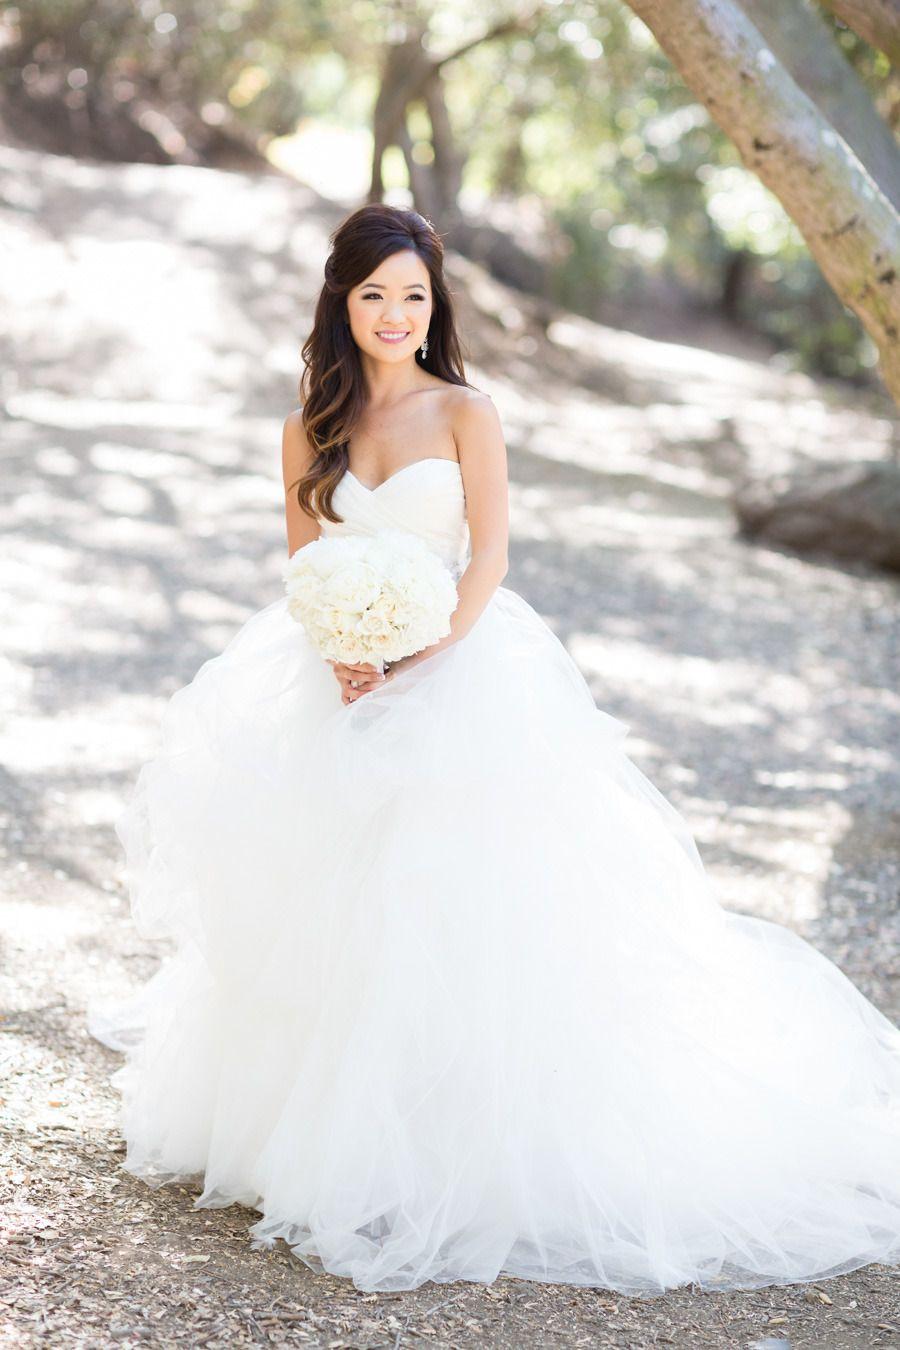 Shabby Chic Calamigos Ranch Wedding Strapless Dress Hairstyles Bride Hairstyles Calamigos Ranch Wedding